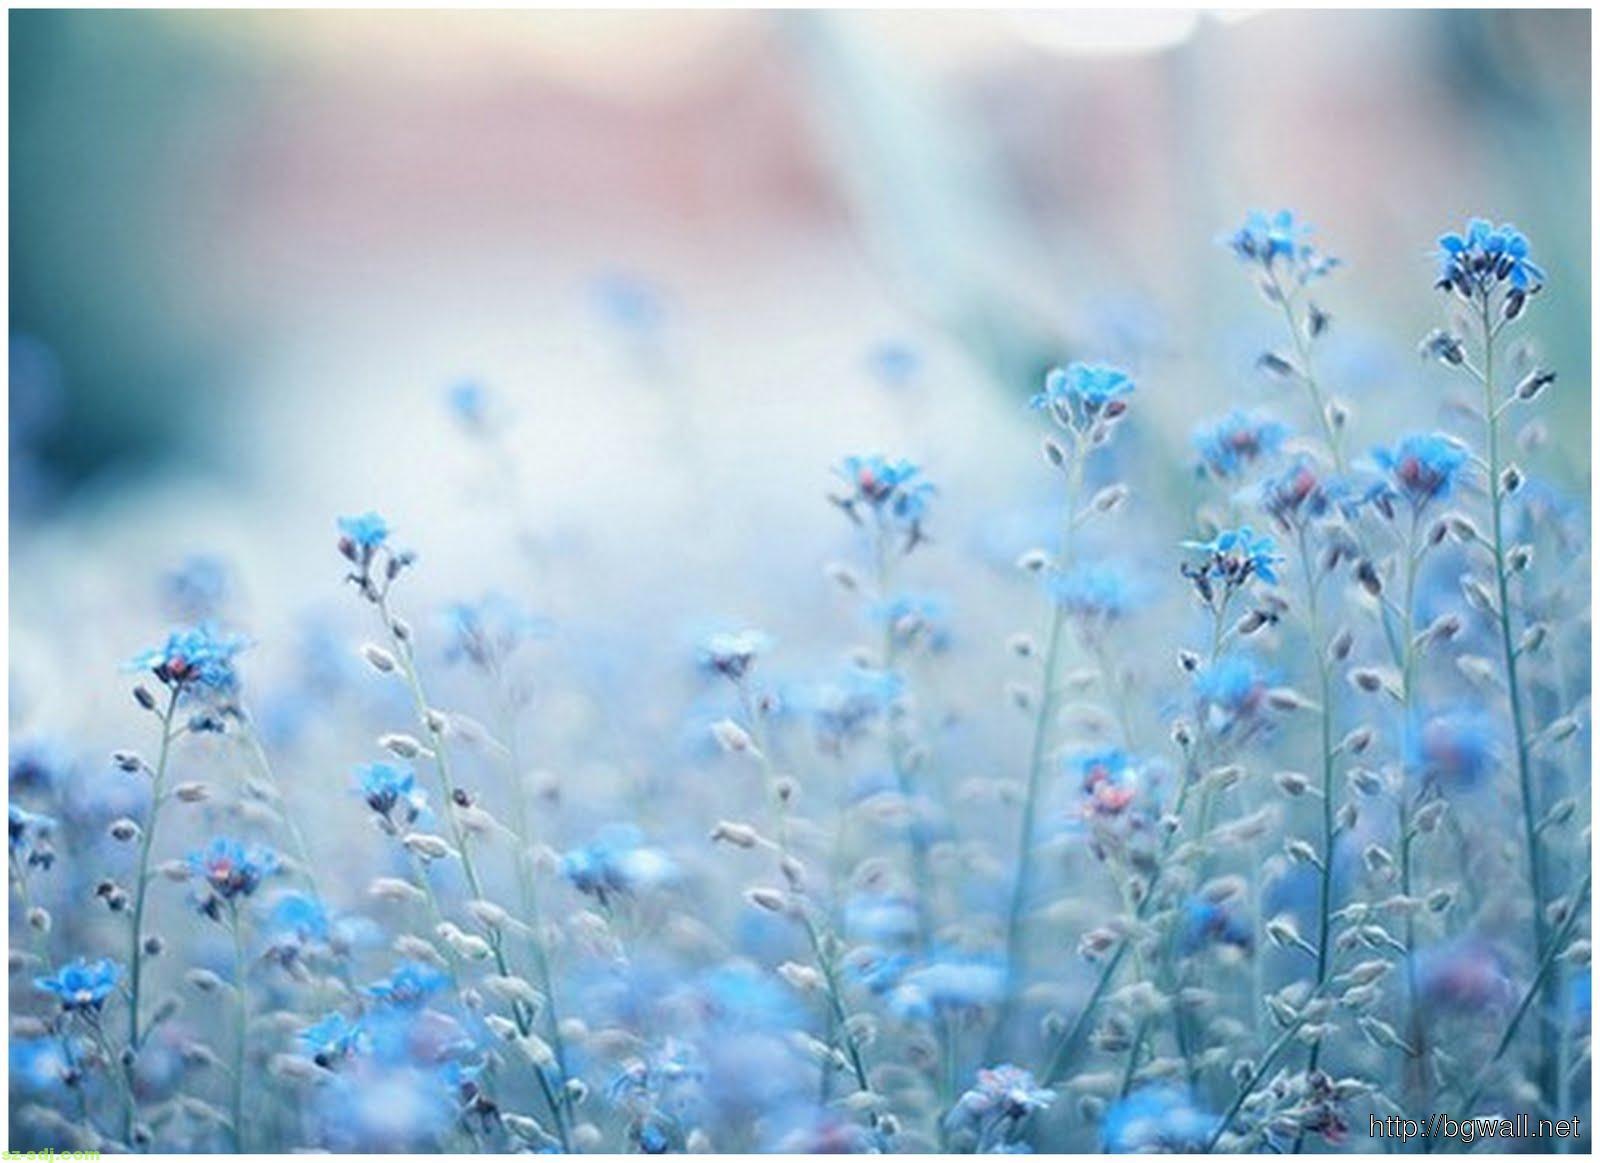 Blue Flowers Tumblr Wallpaper Background Wallpaper Hd